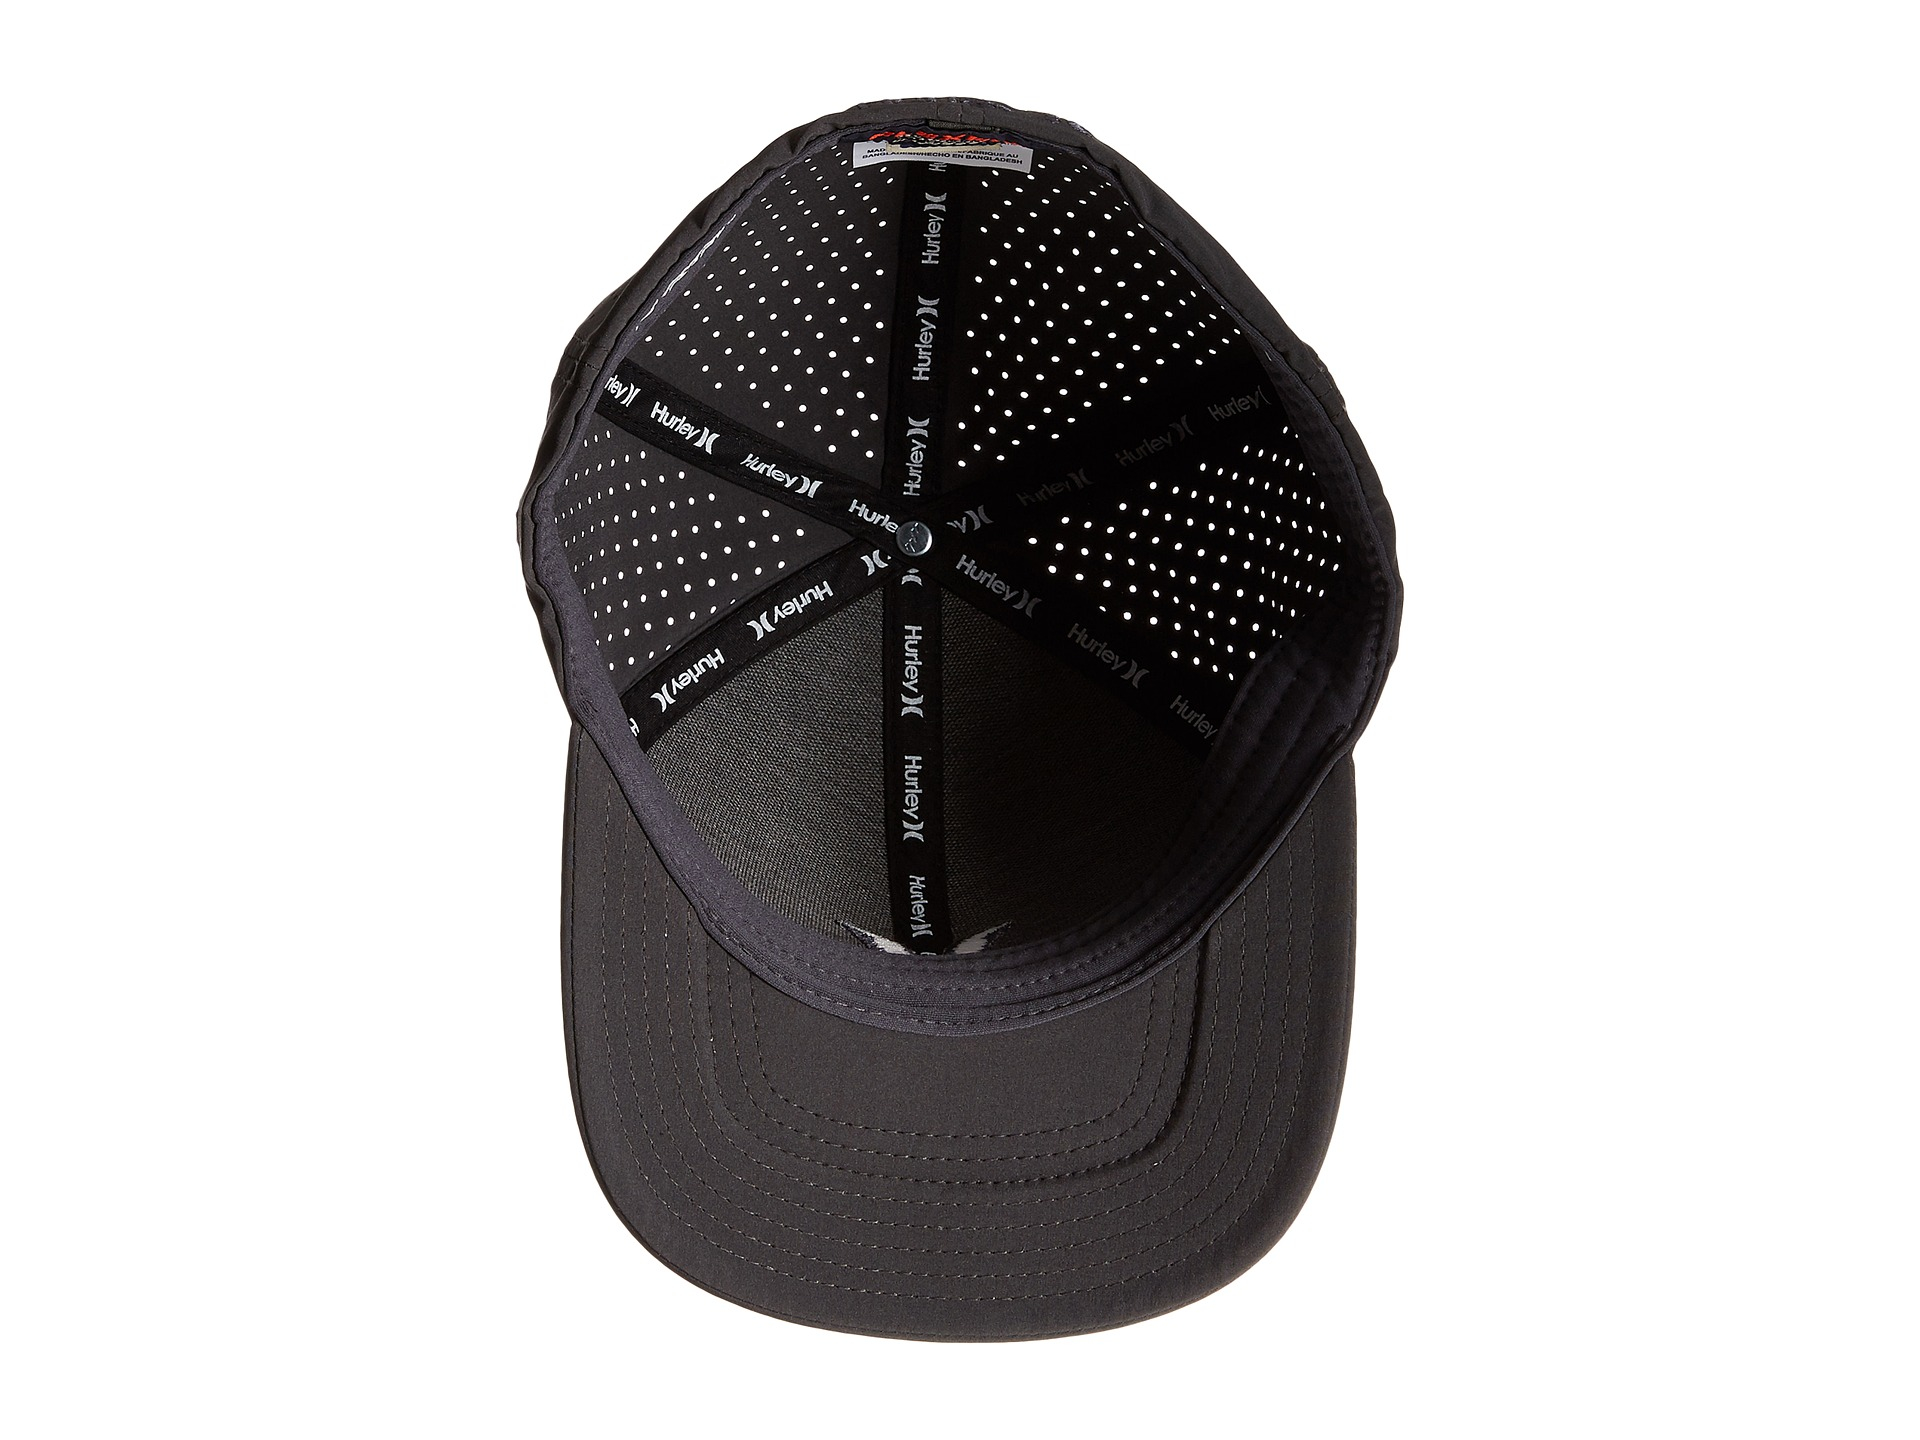 cadff2055 where to buy hurley vapor hat 55c0d e6c12